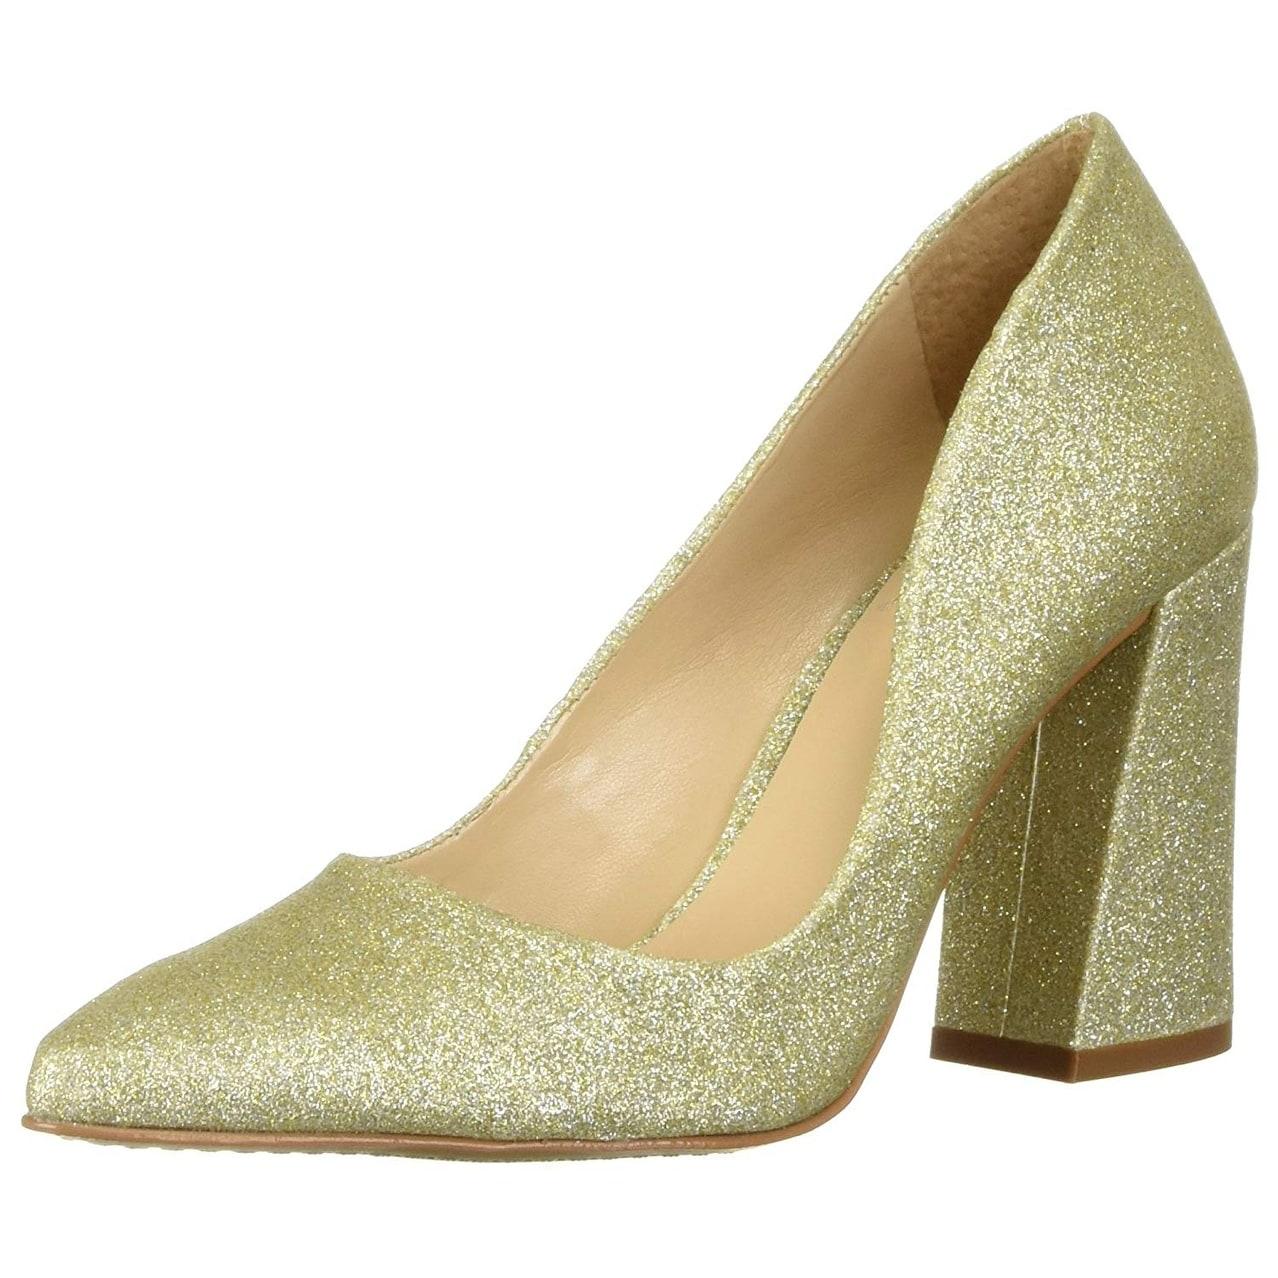 dedef6a1f6 Buy Vince Camuto Women's Heels Online at Overstock | Our Best Women's Shoes  Deals